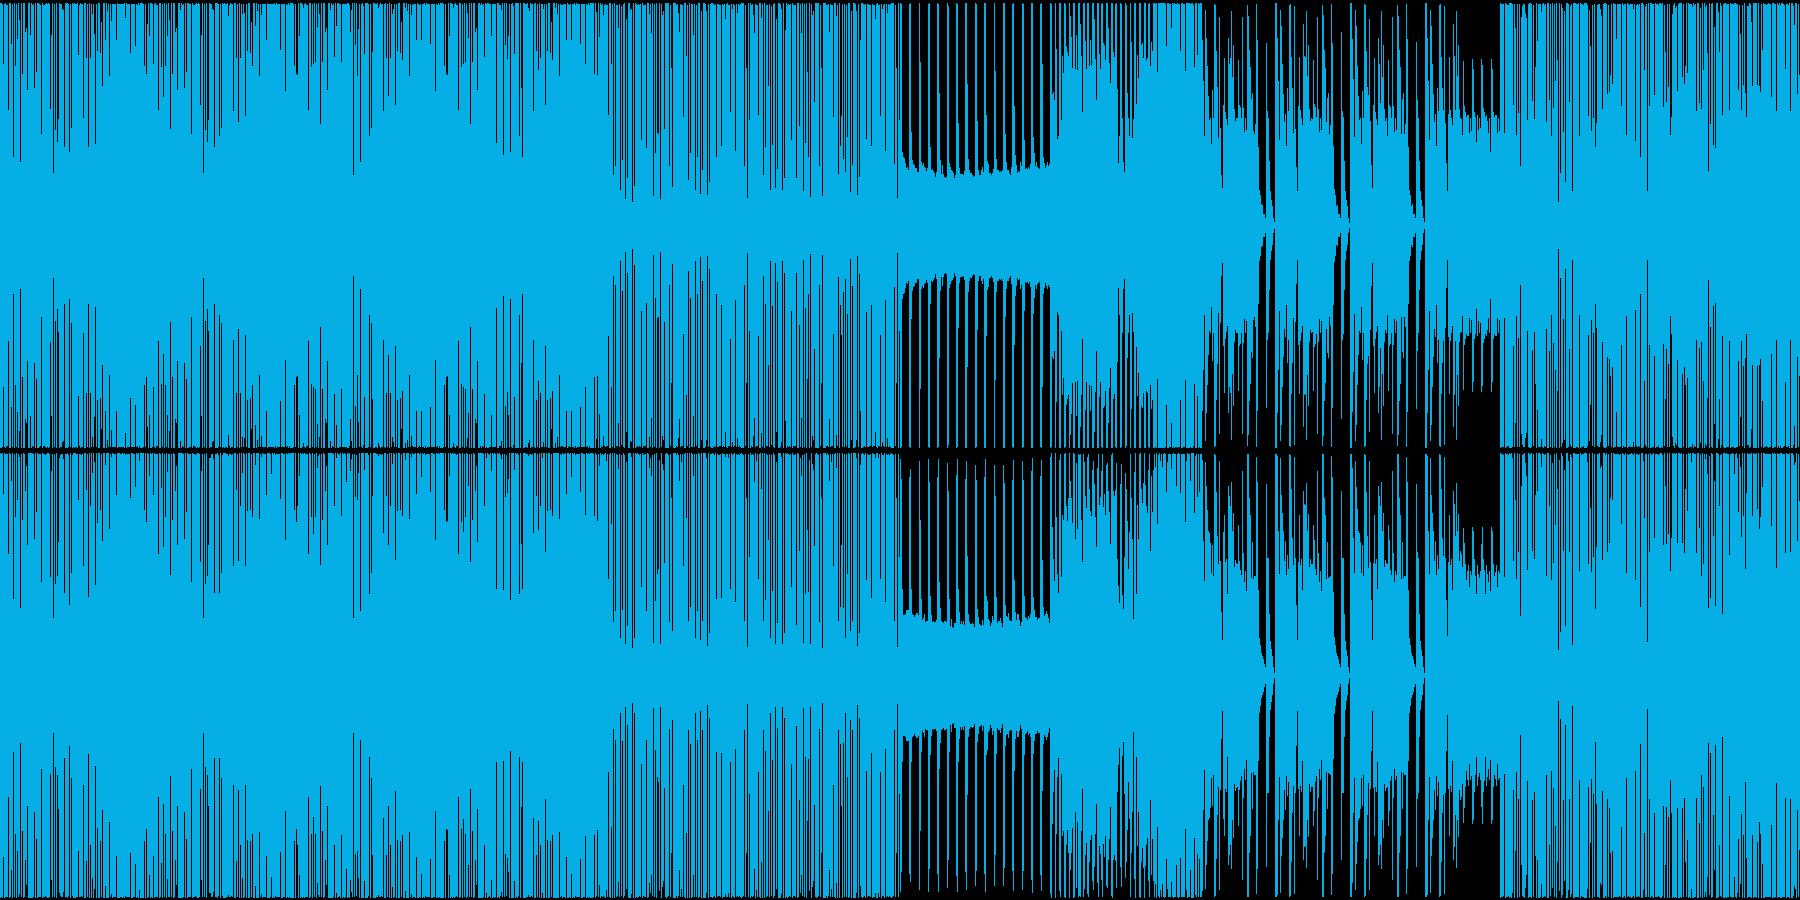 HIPHOP トロピカル EDM ループの再生済みの波形